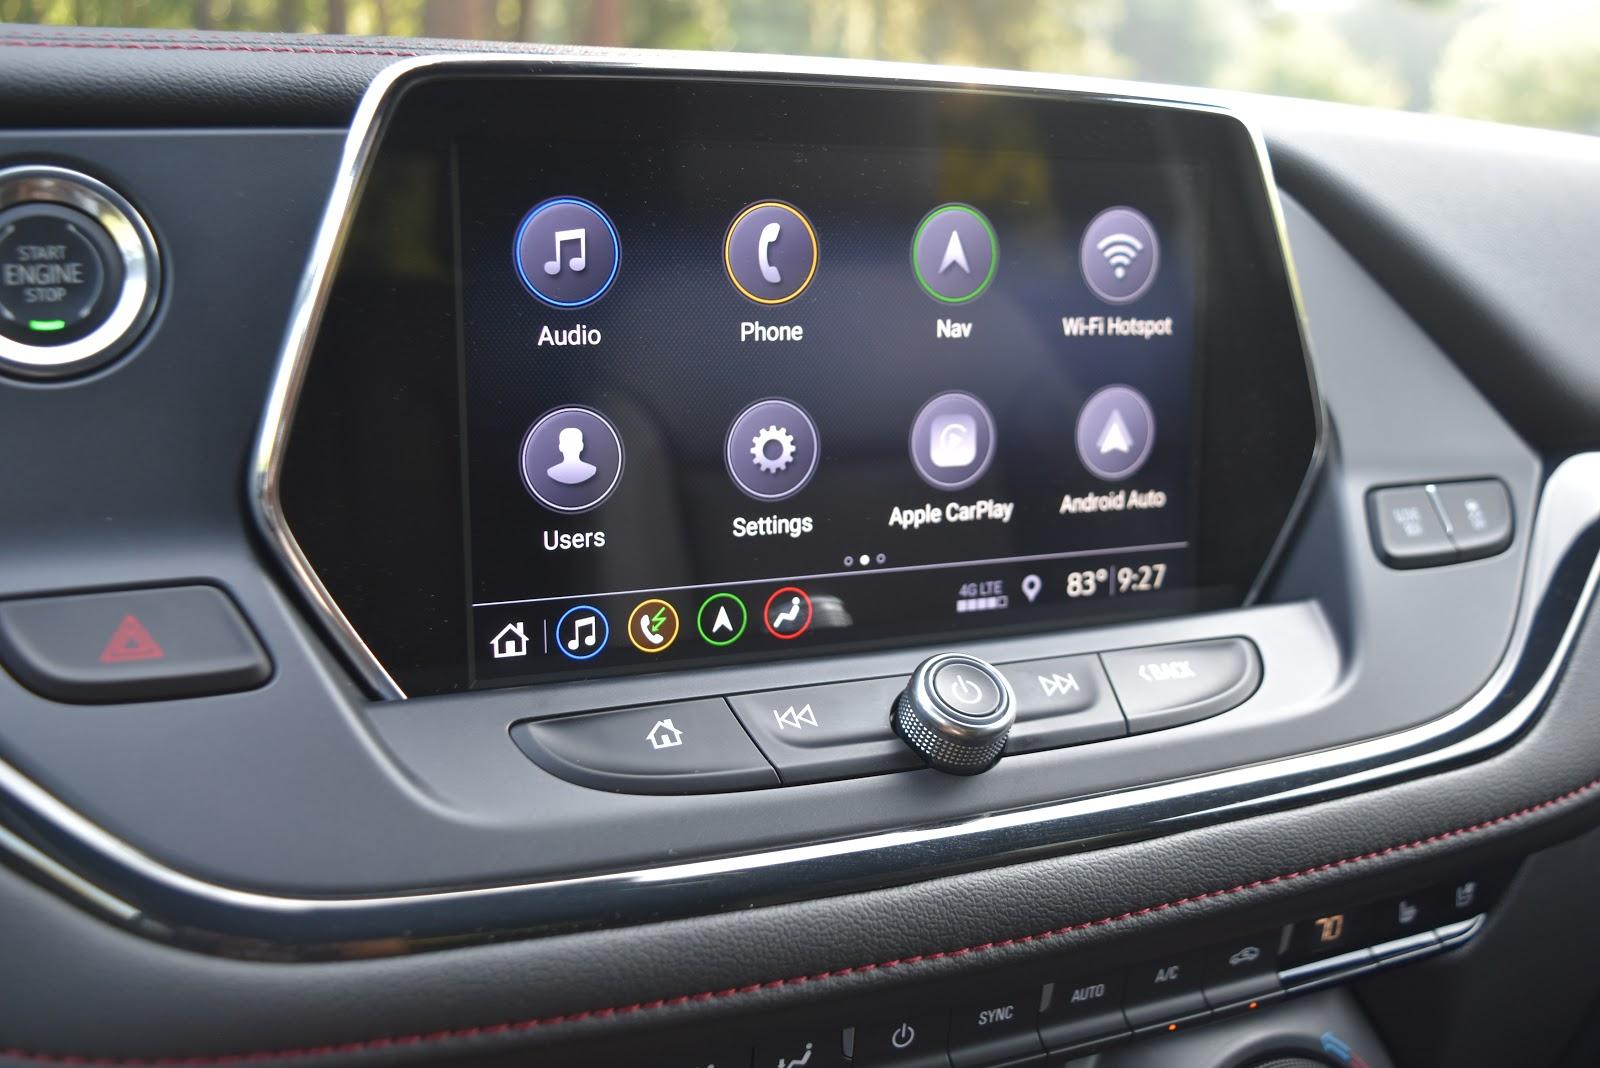 2019 Chevy Blazer Navigation System